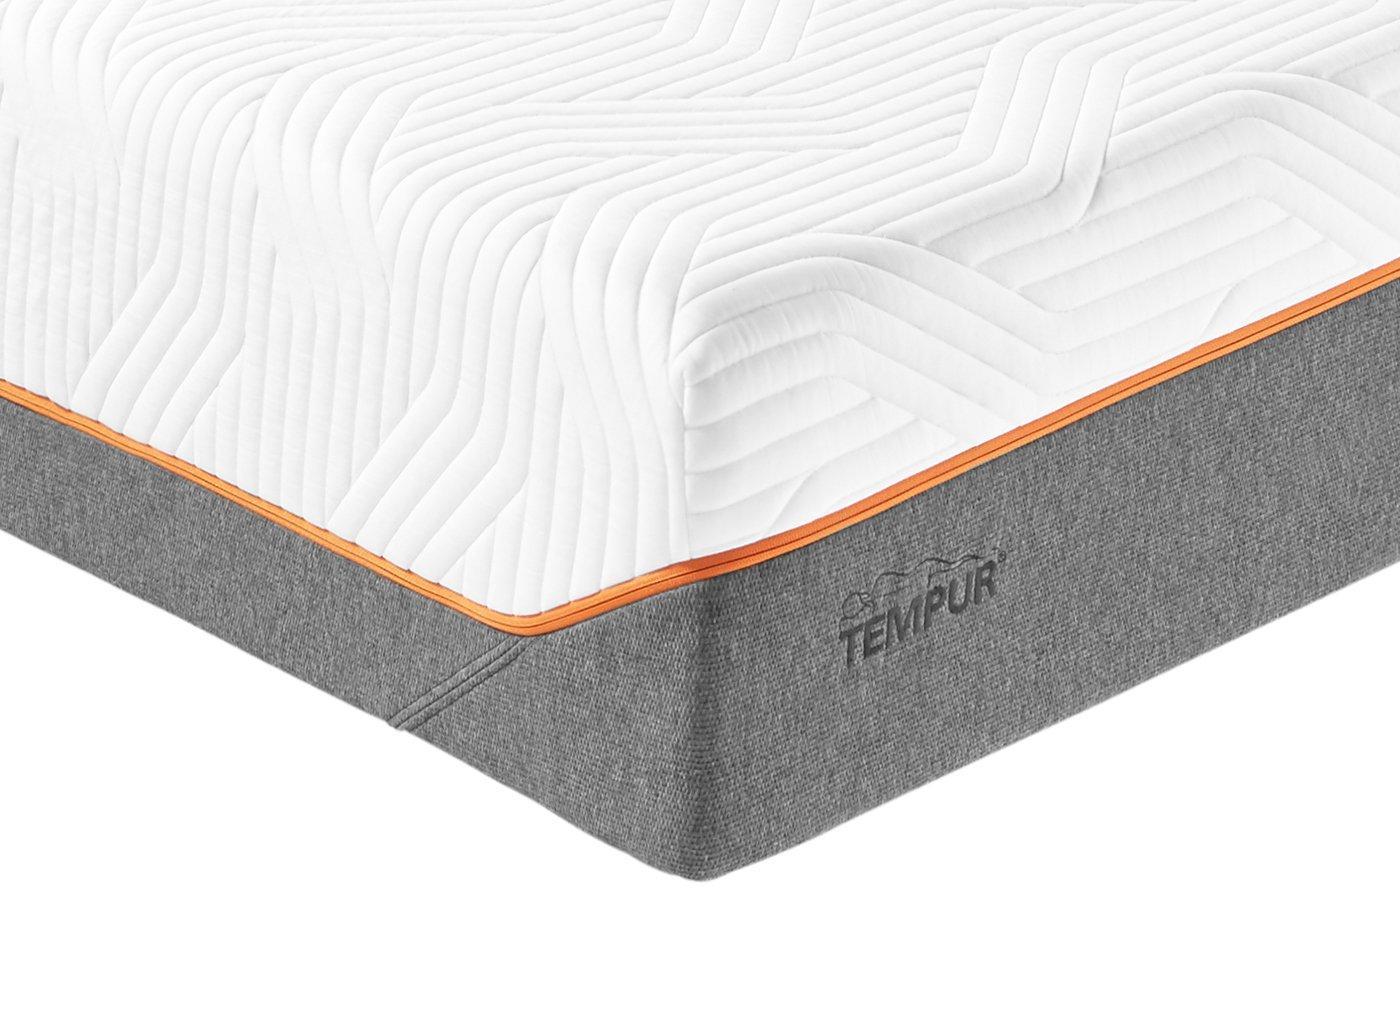 Tempur Cooltouch Original Luxe Adjustable Mattress - Medium Firm 2'6 Small single